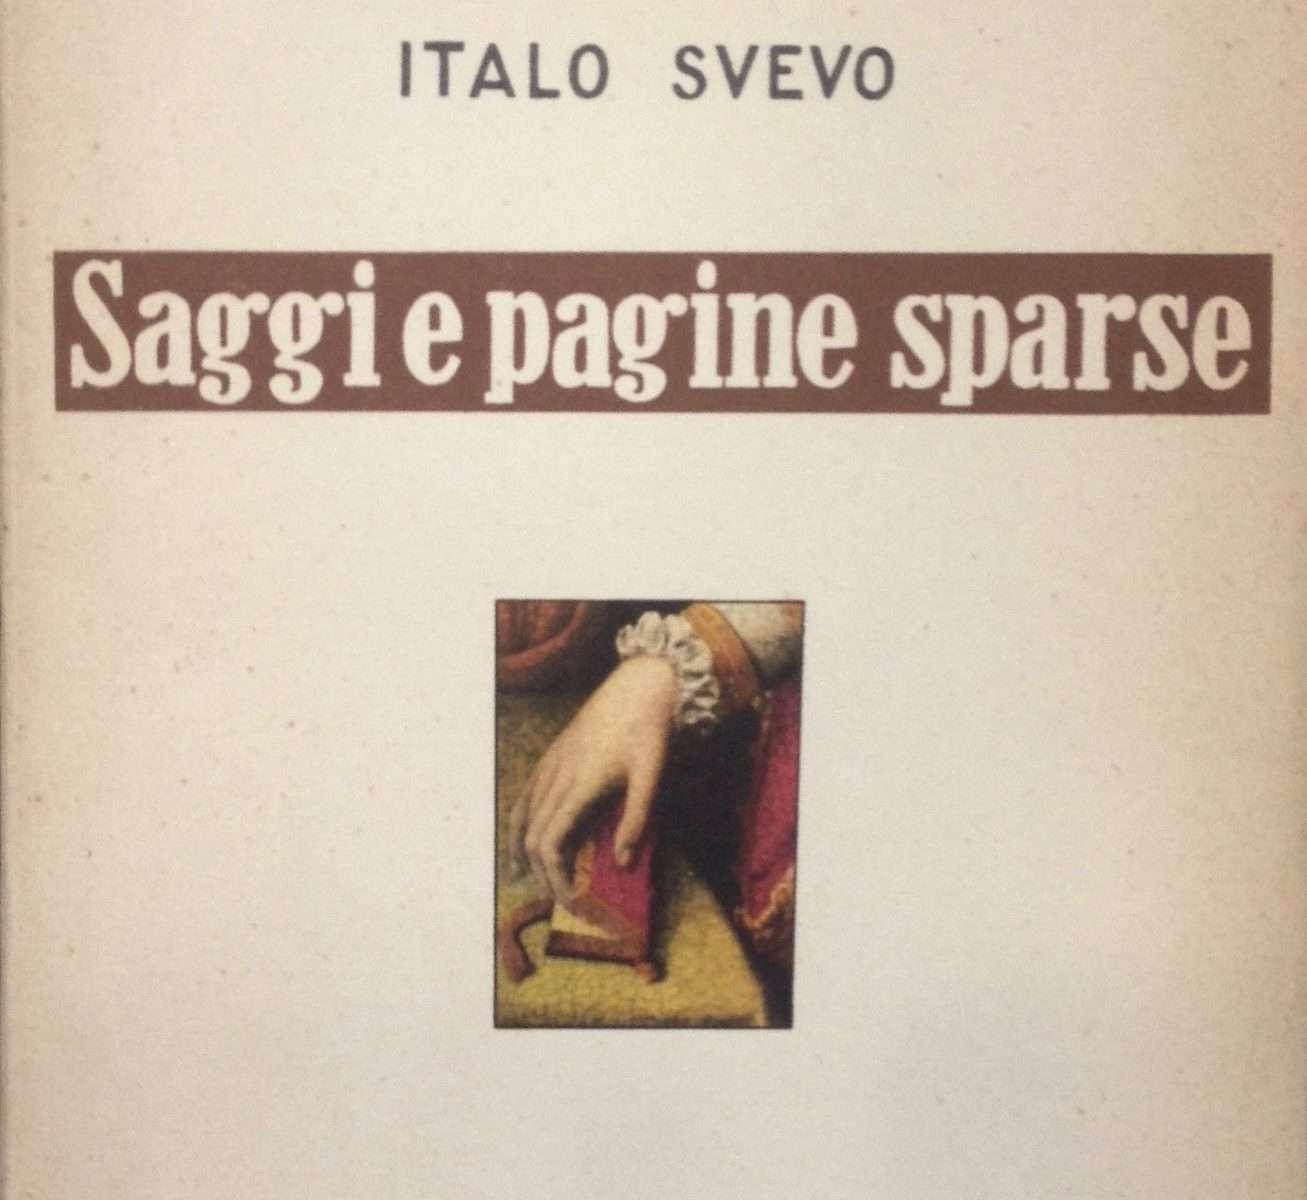 SAGGI E PAGINE SPARSE  <BR/> Italo Svevo